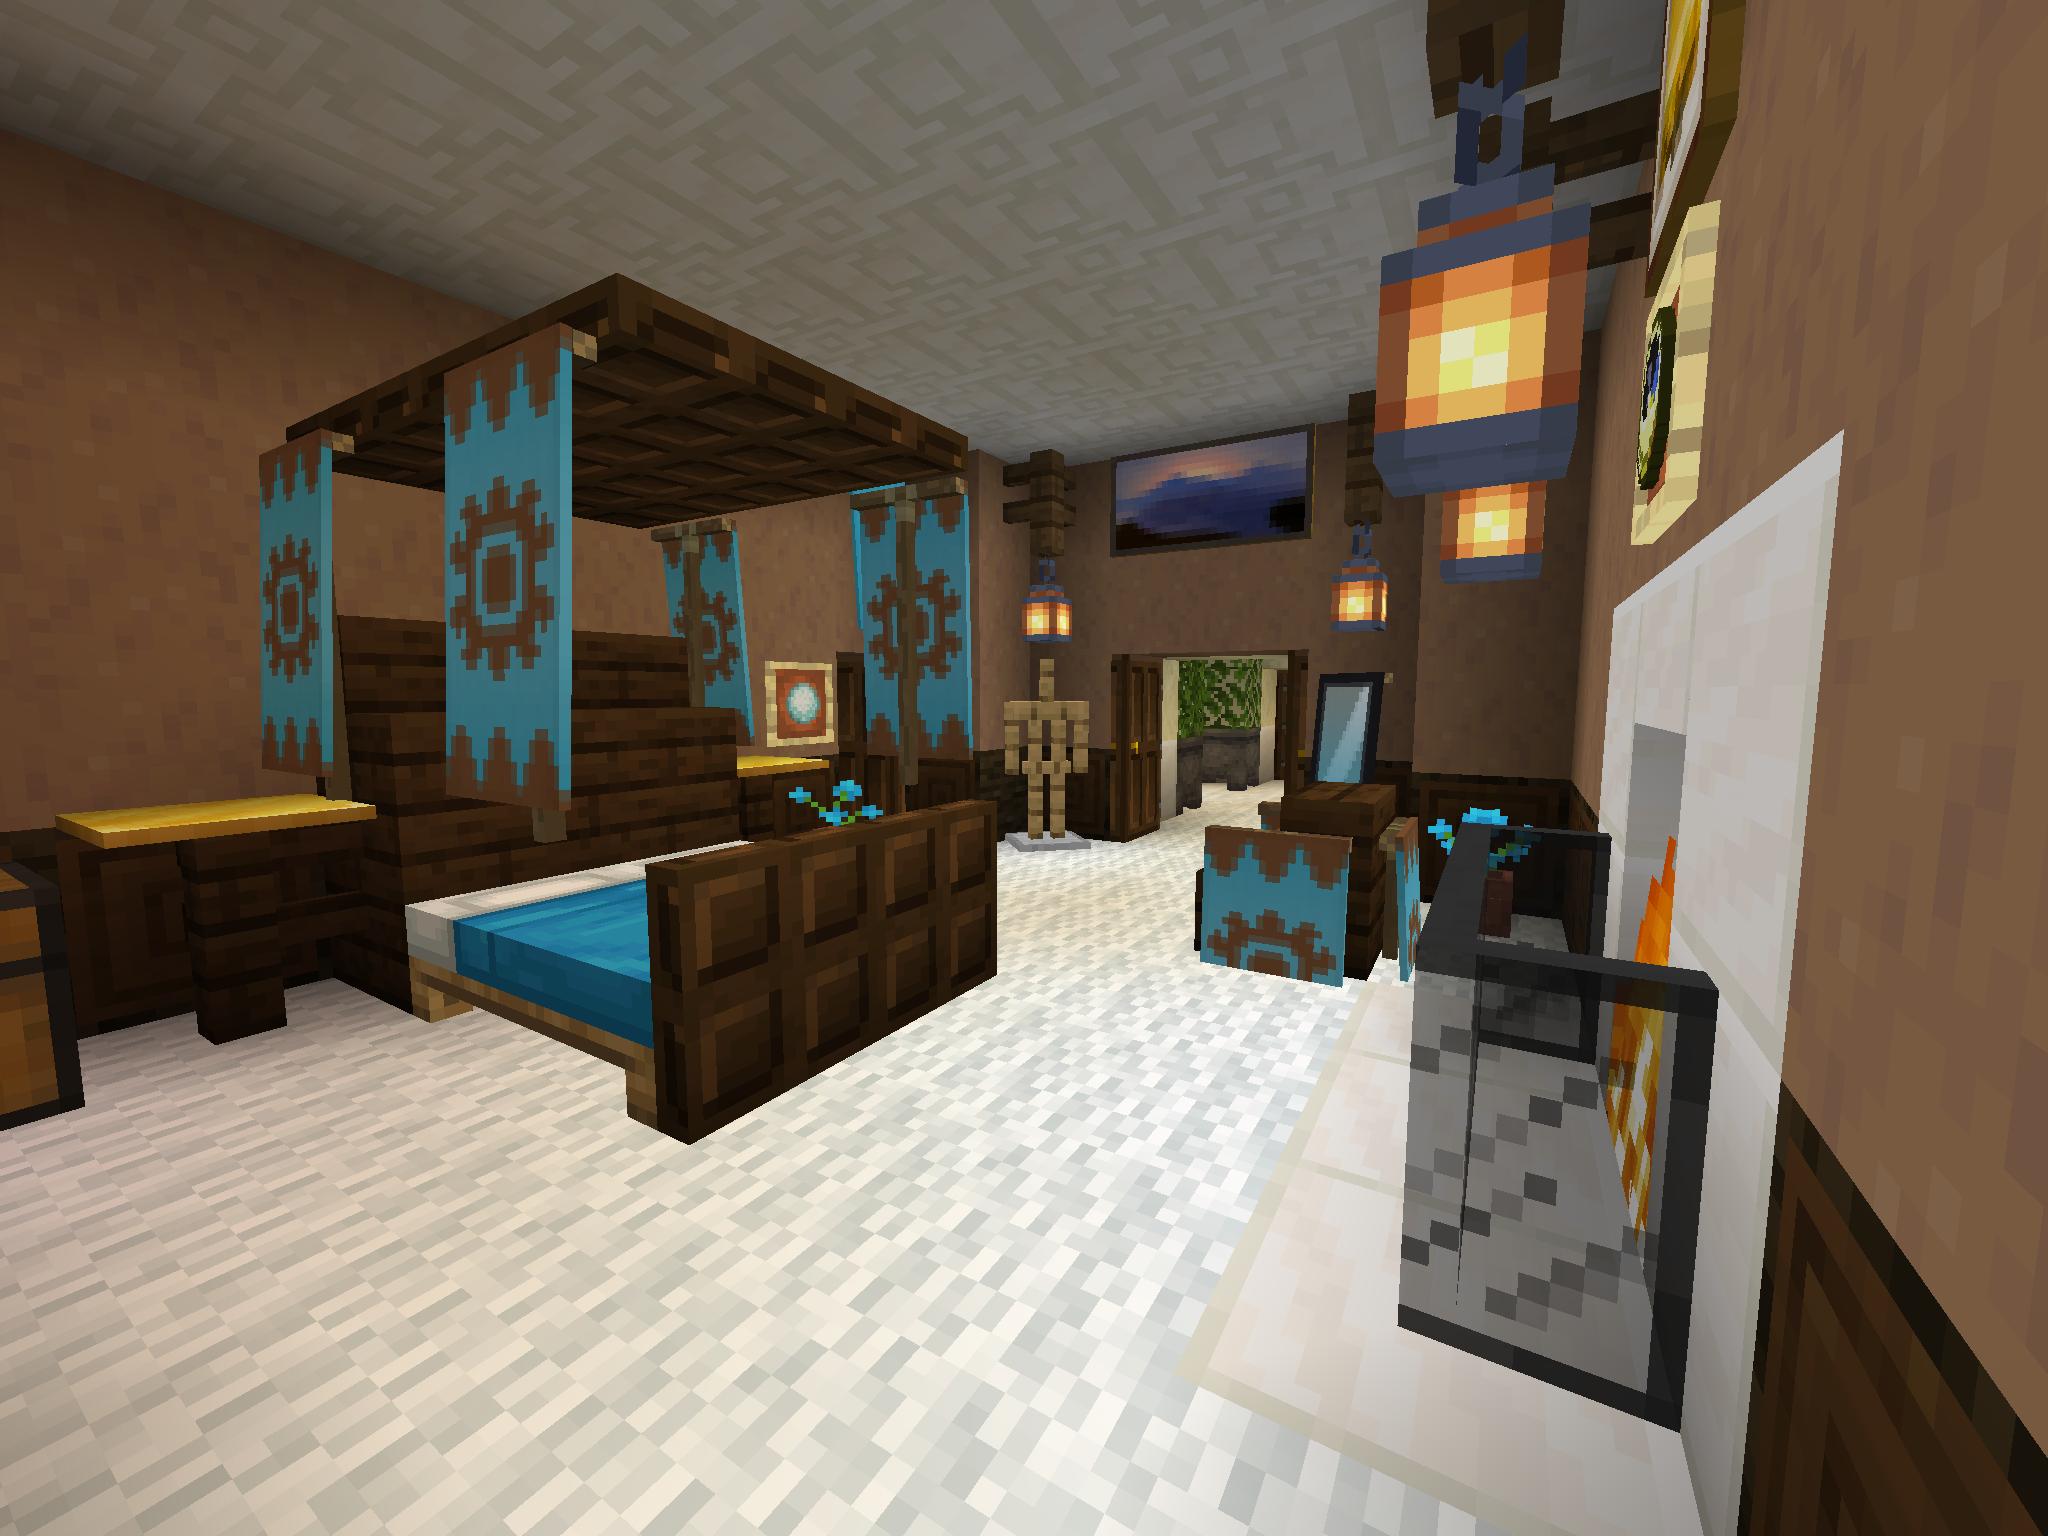 Fireplace Master Bedroom Minecraft Room Minecraft Bed